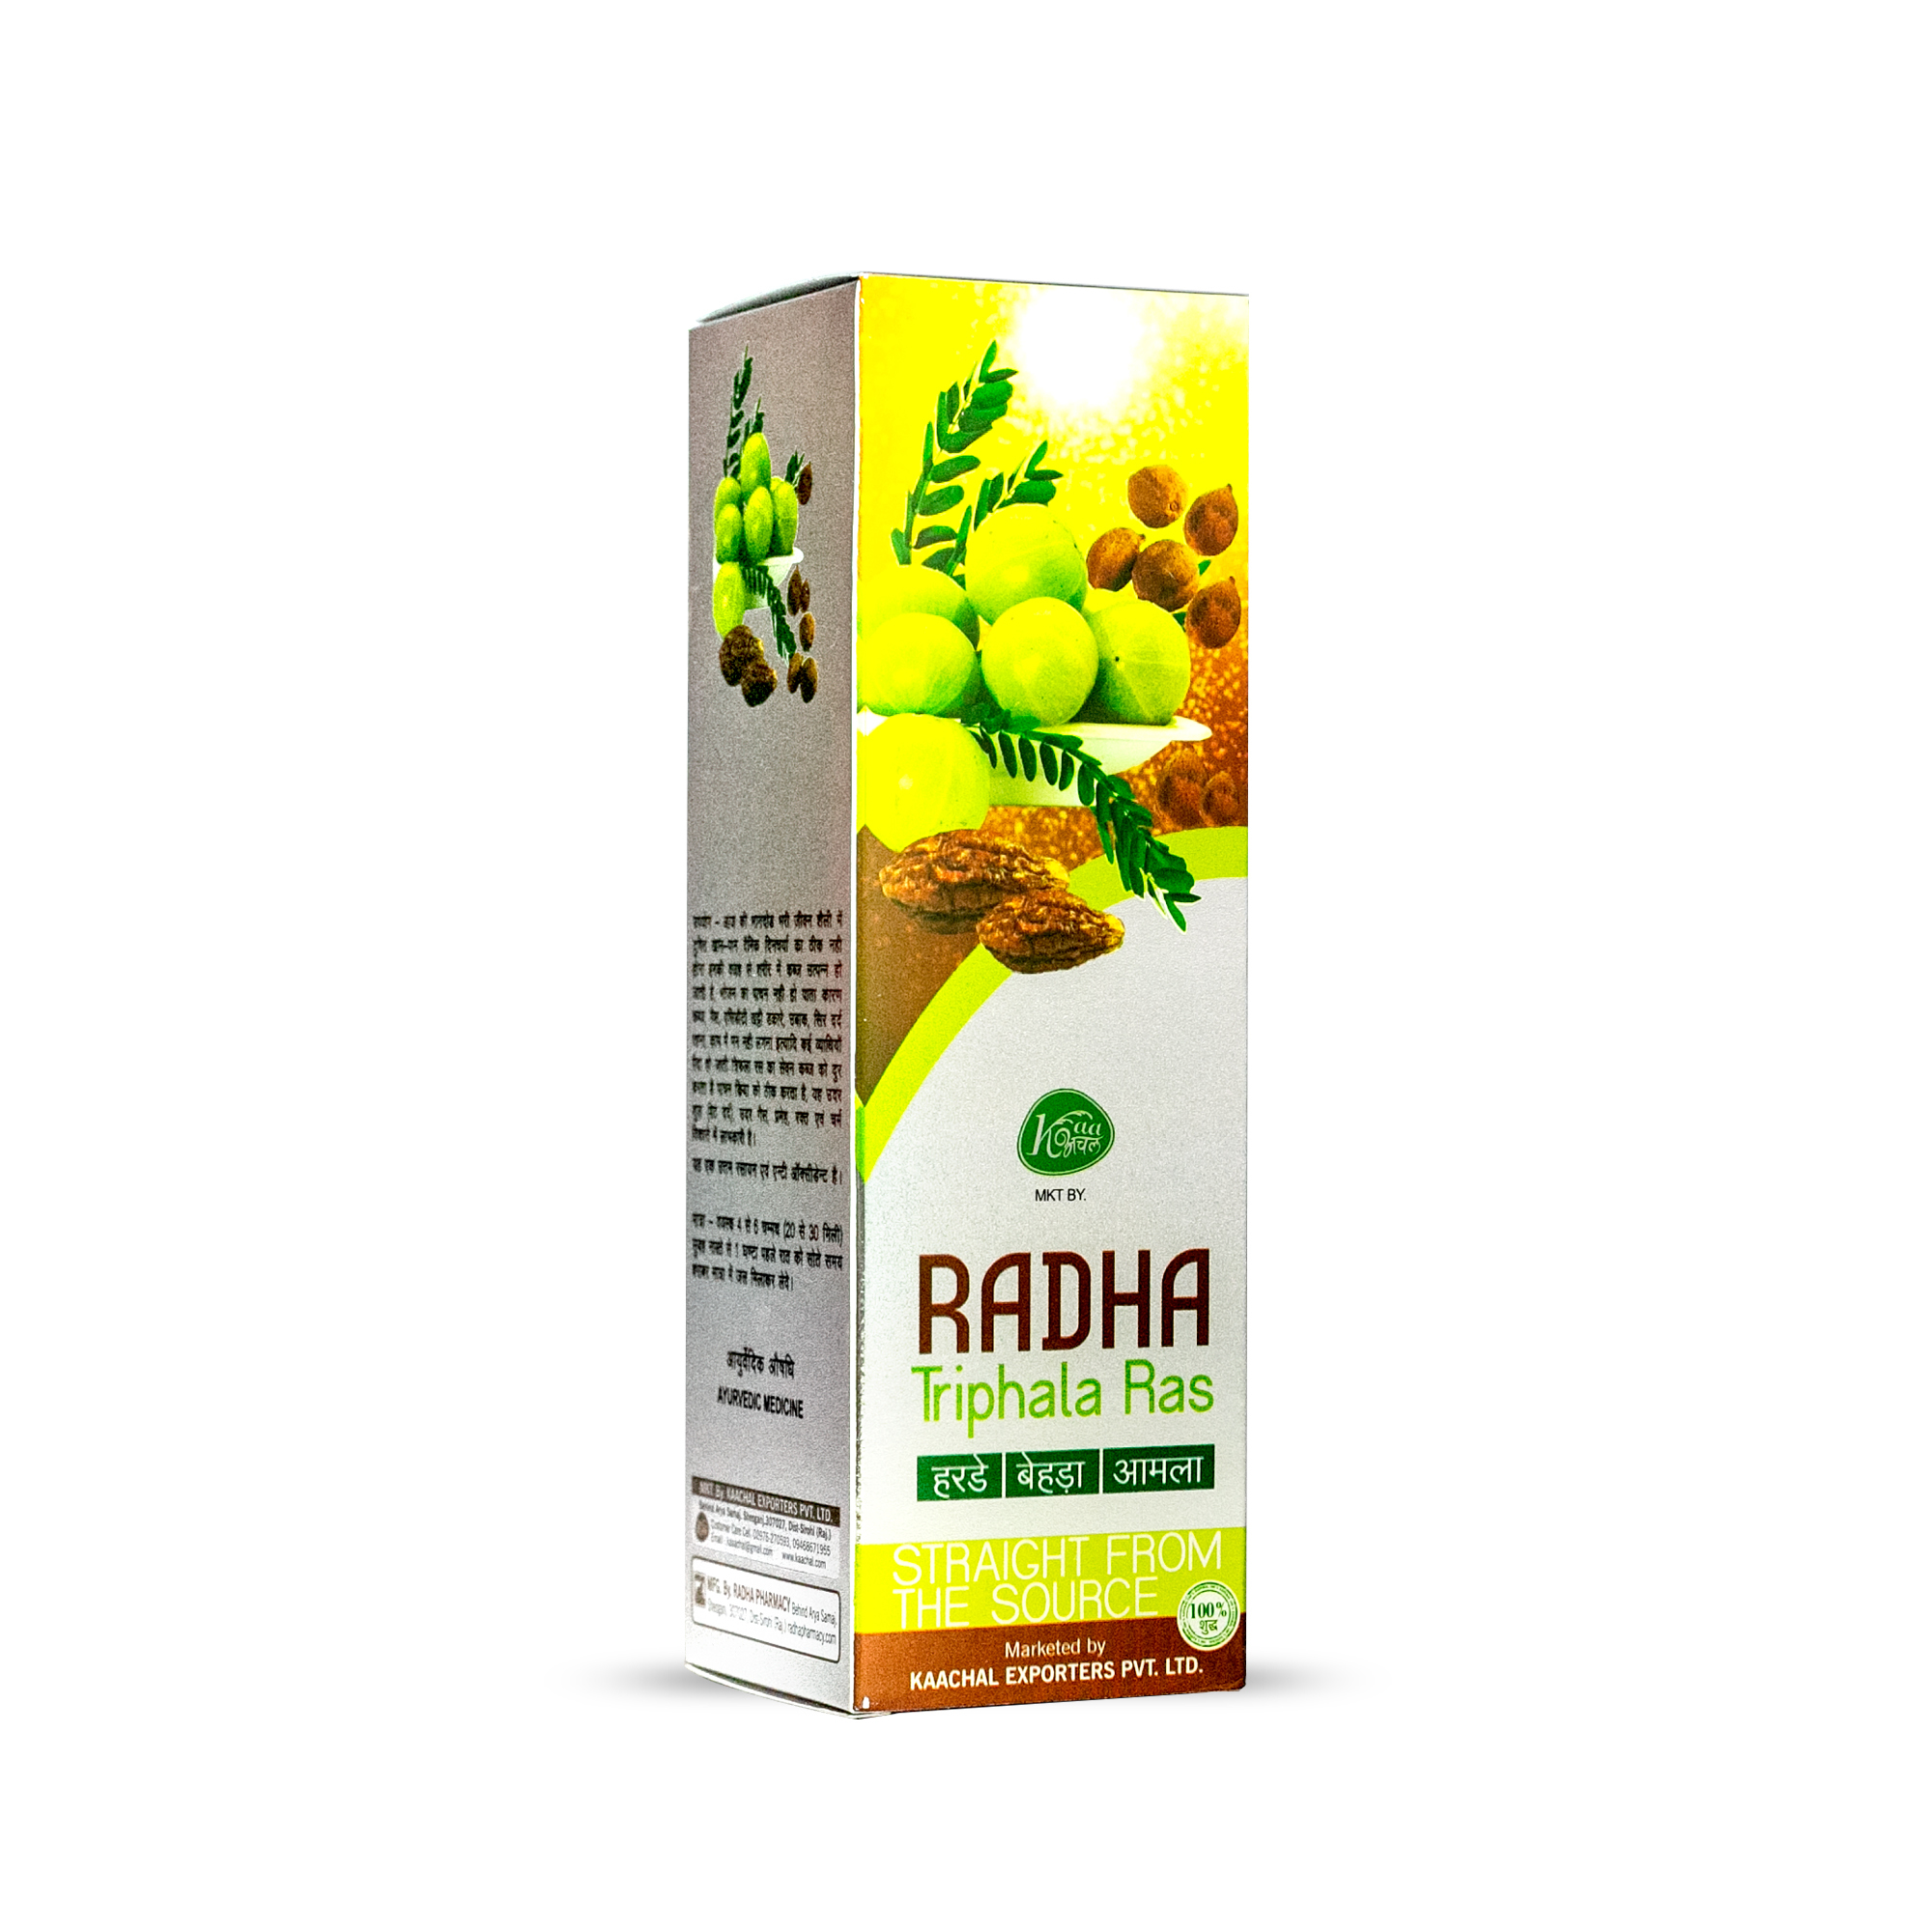 Radha Triphala Ras